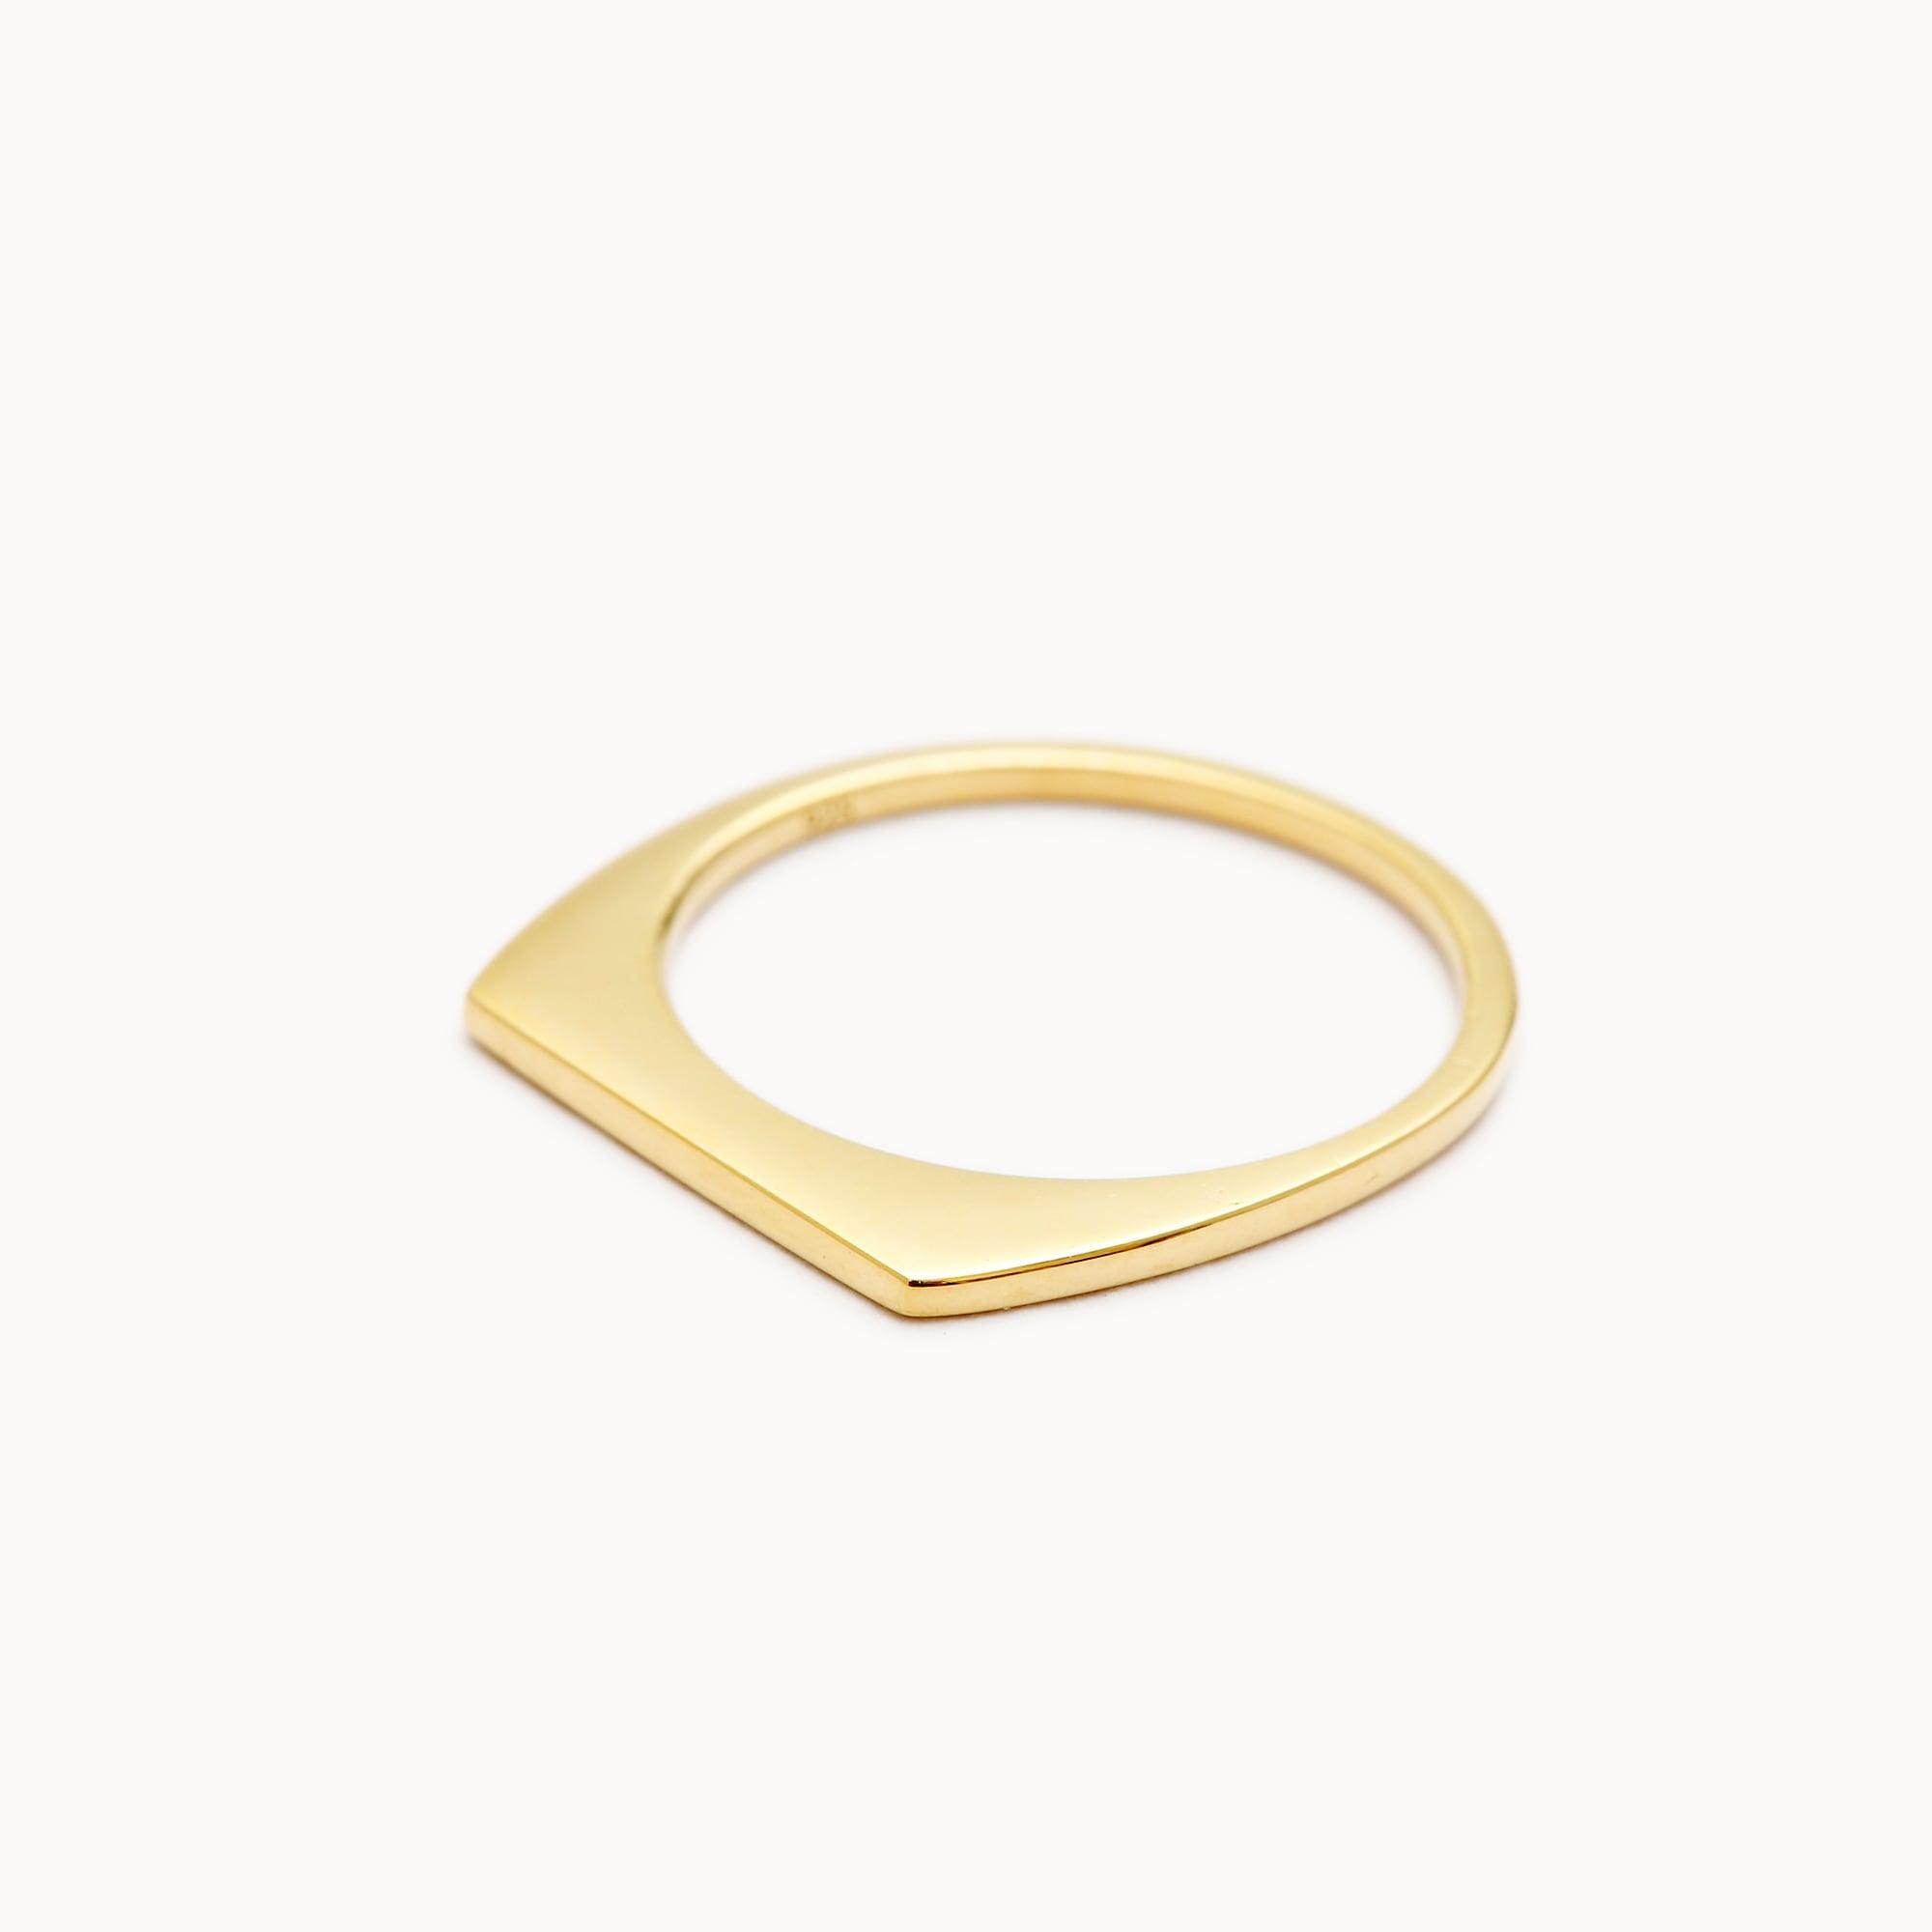 Pinky Ring ピンキーリング - art.1607P042020